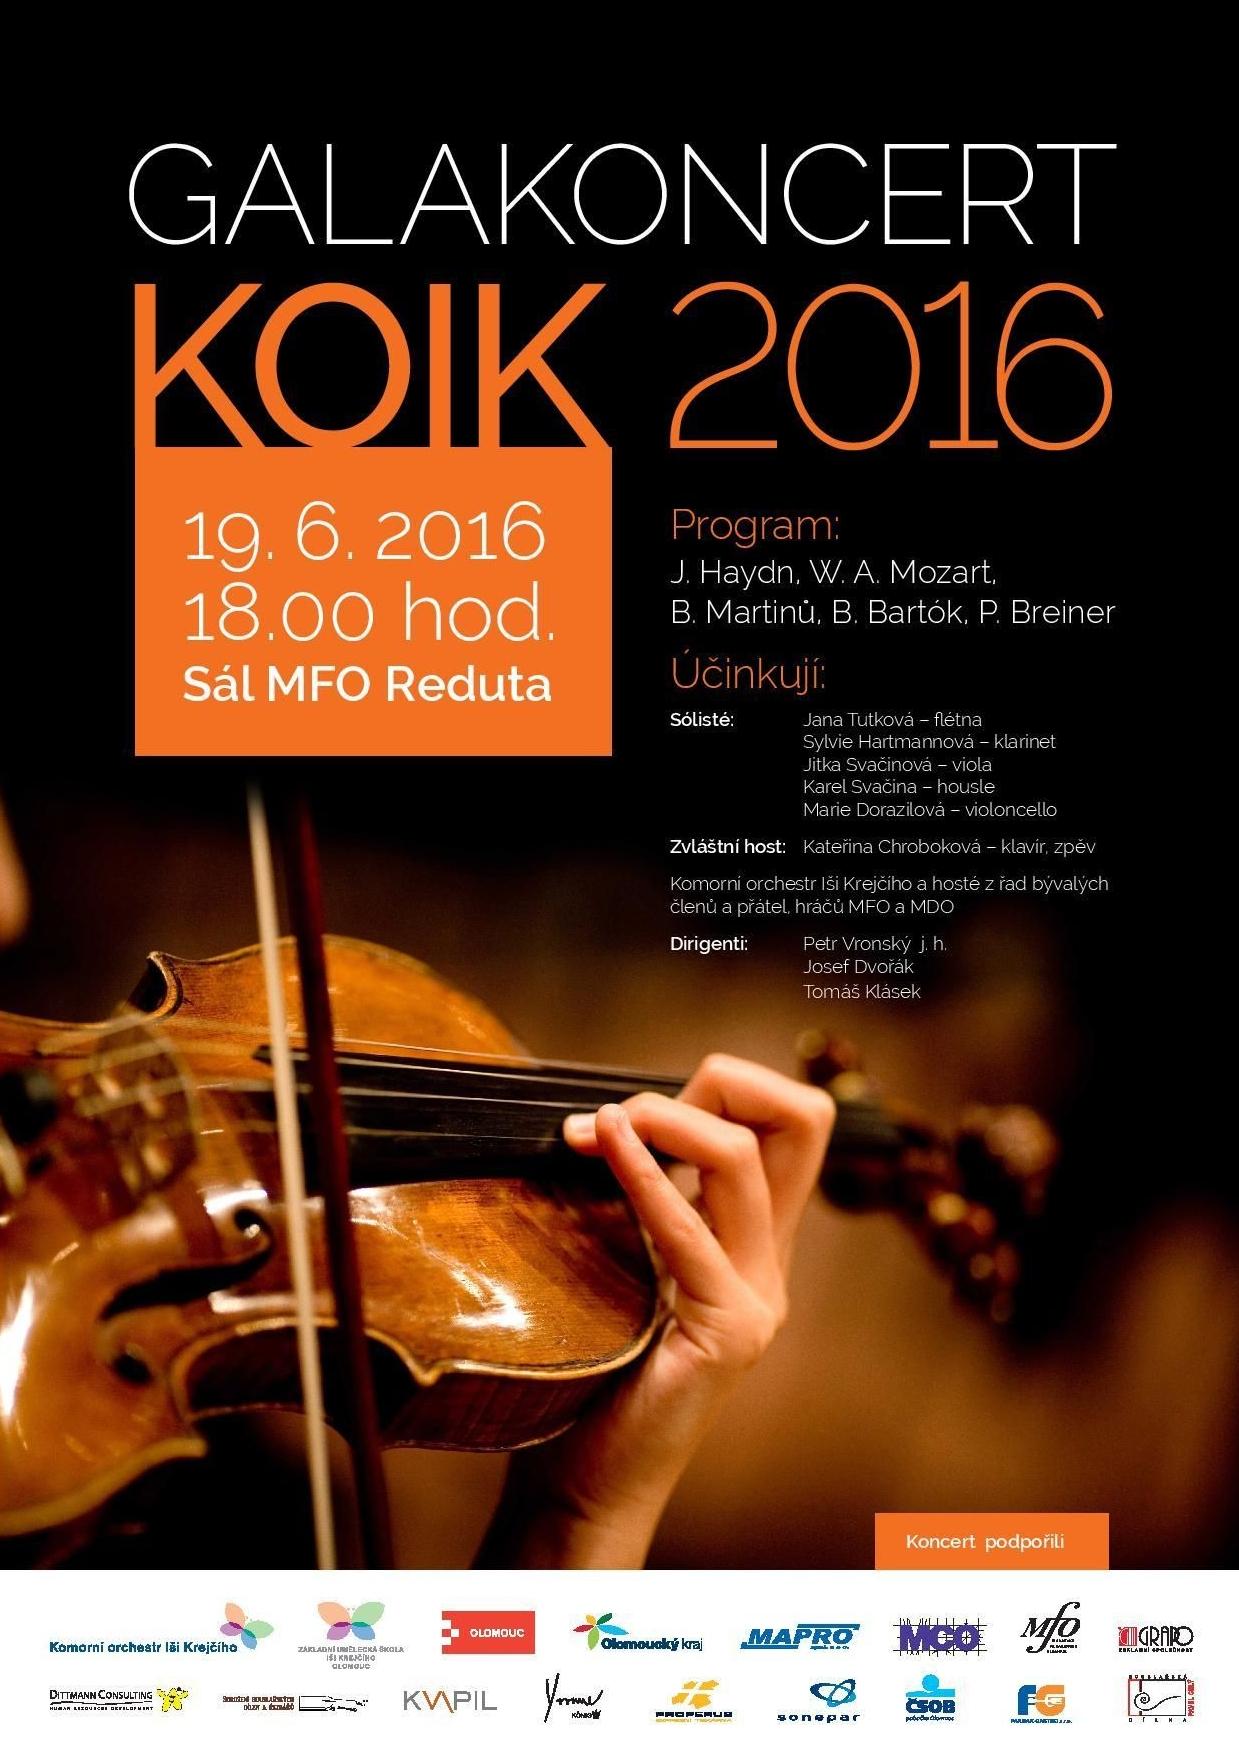 Galakoncert KOIK 2016